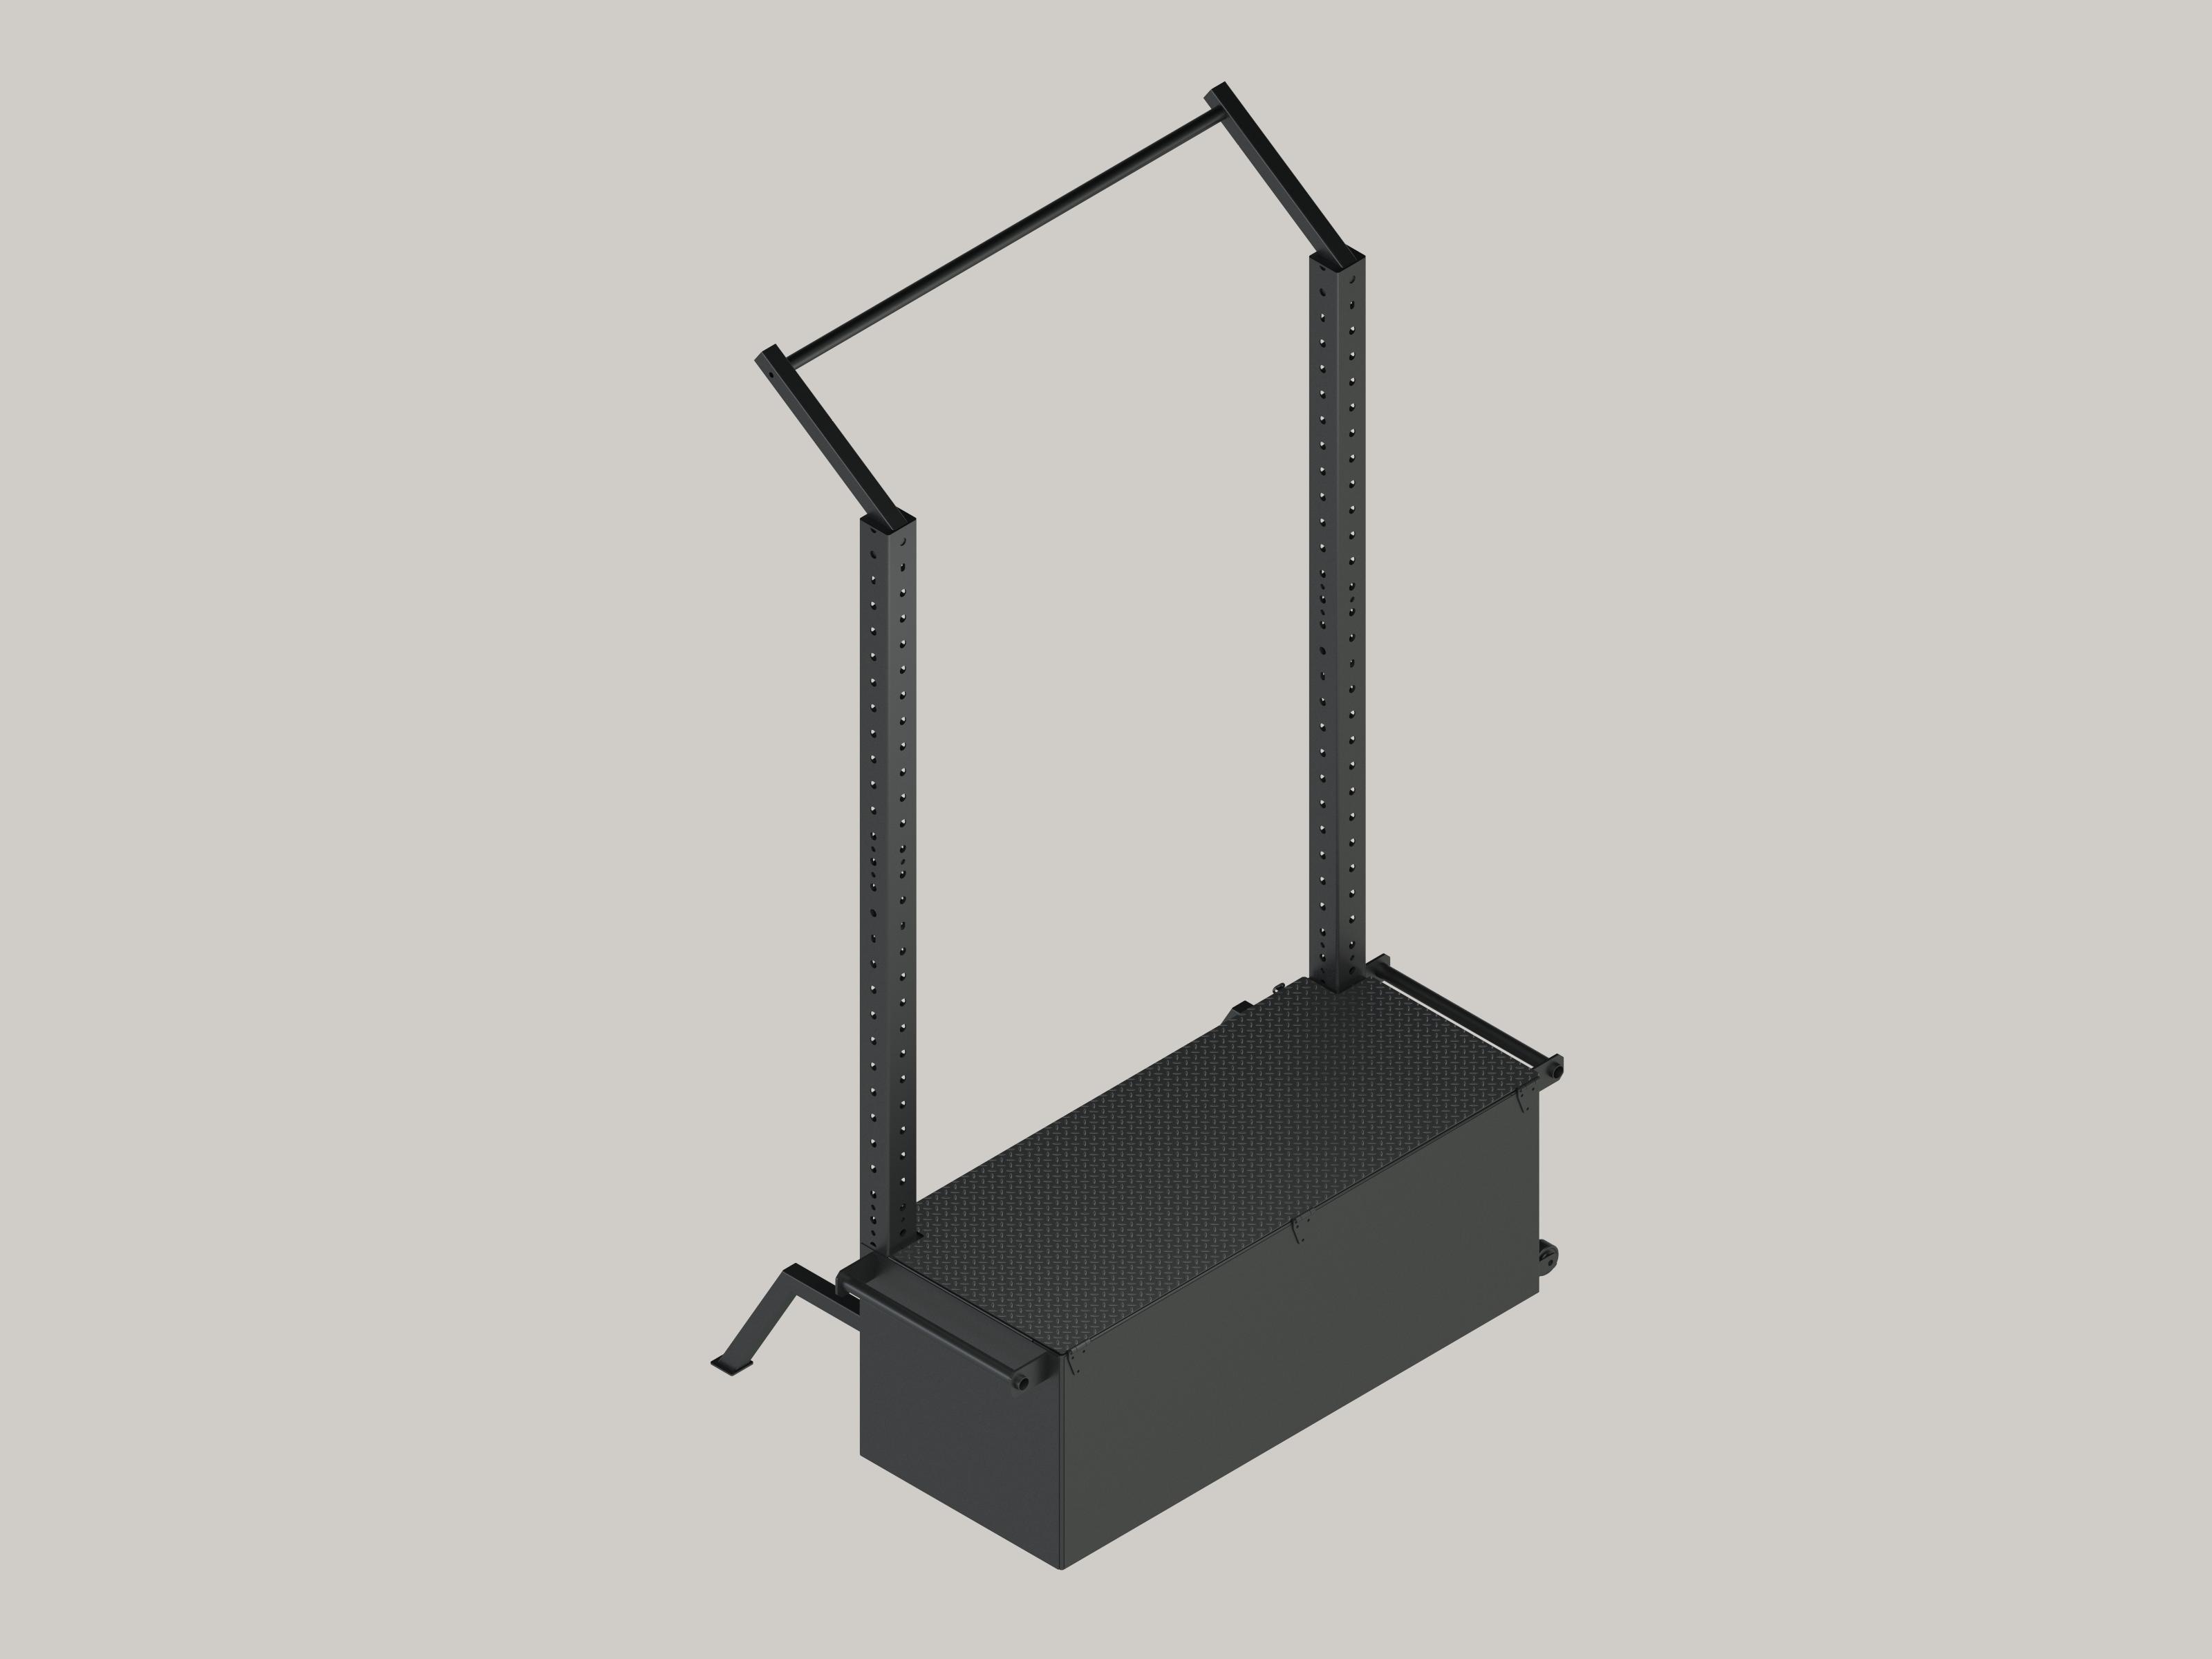 FUNS M - Tactical Box ohne Zubehör anthrazit grau